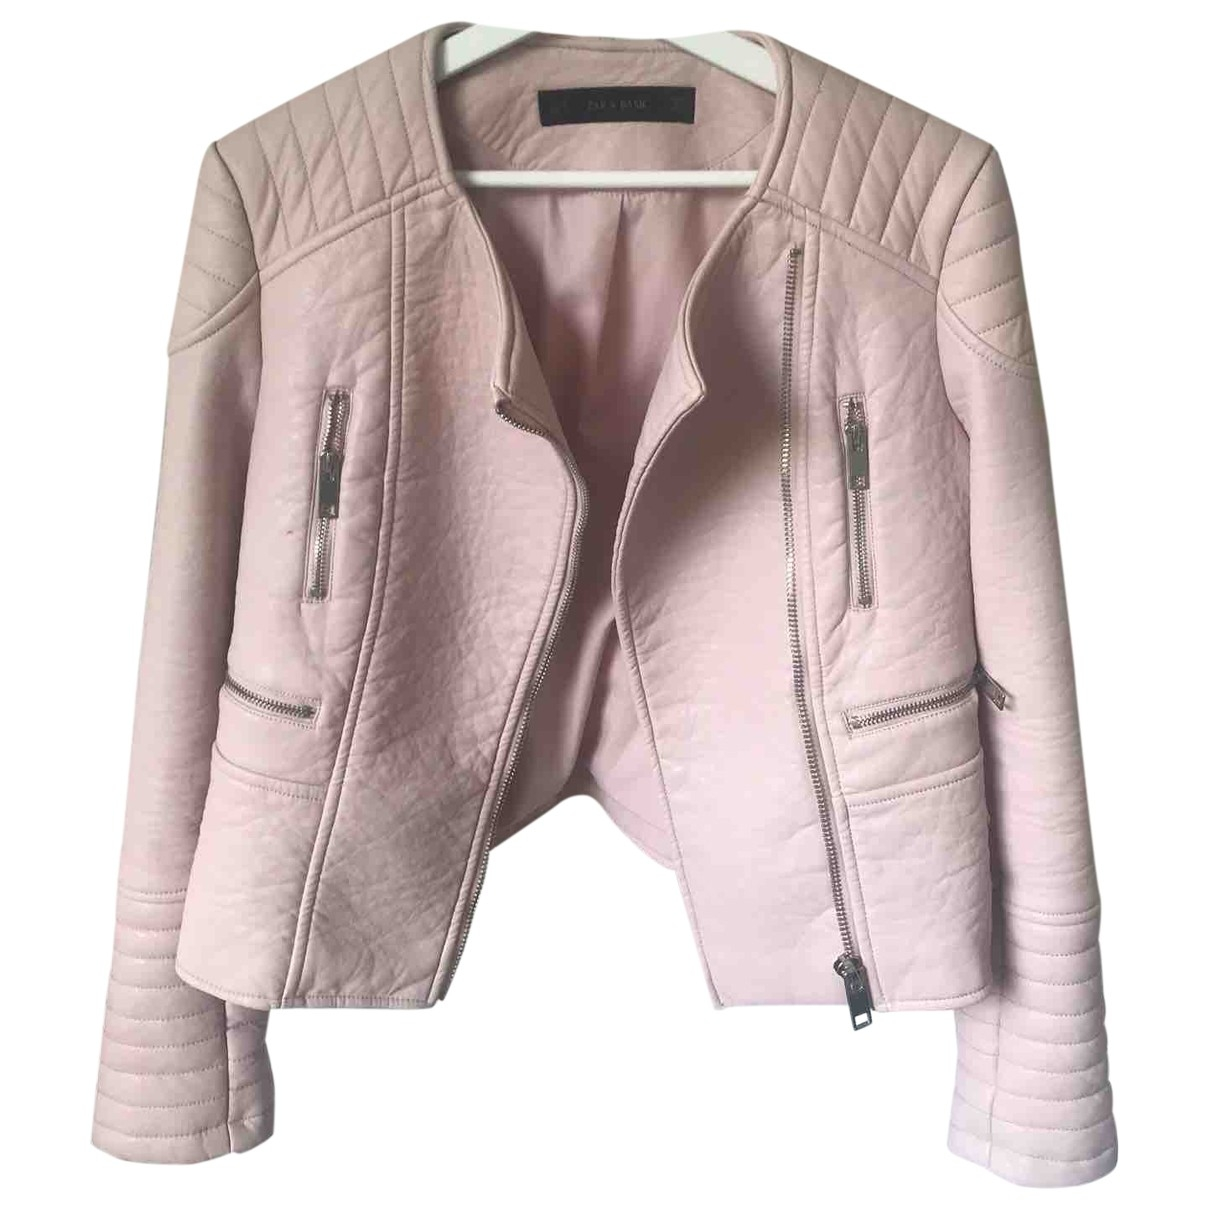 Zara \N Pink Leather jacket for Women M International